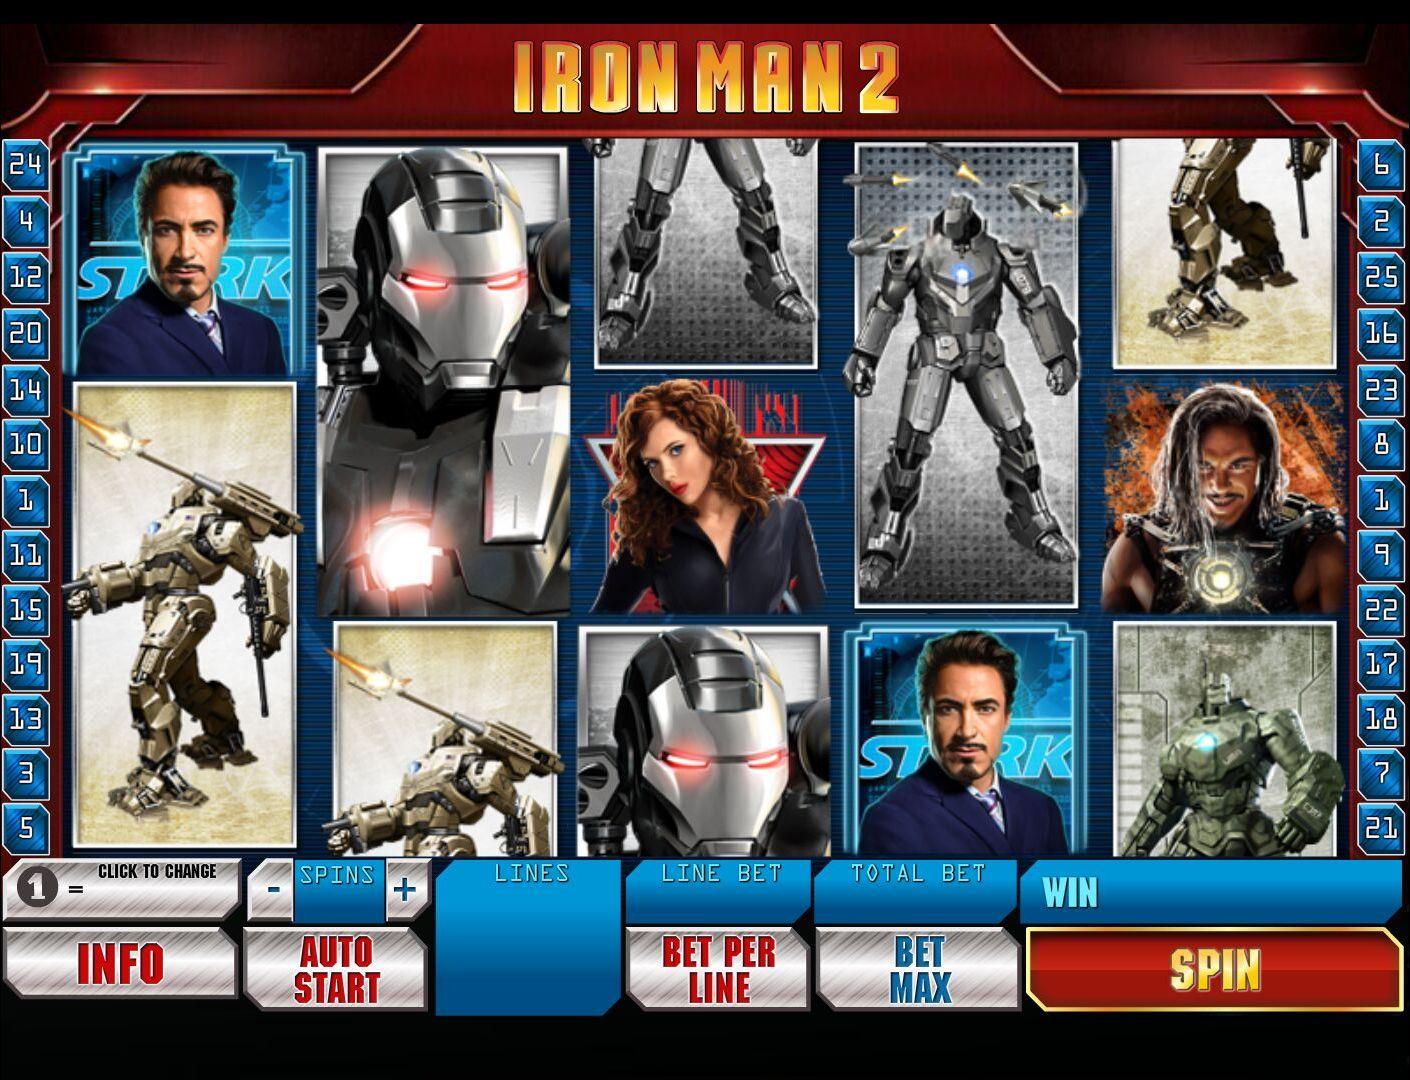 Iron man 2 slots free online